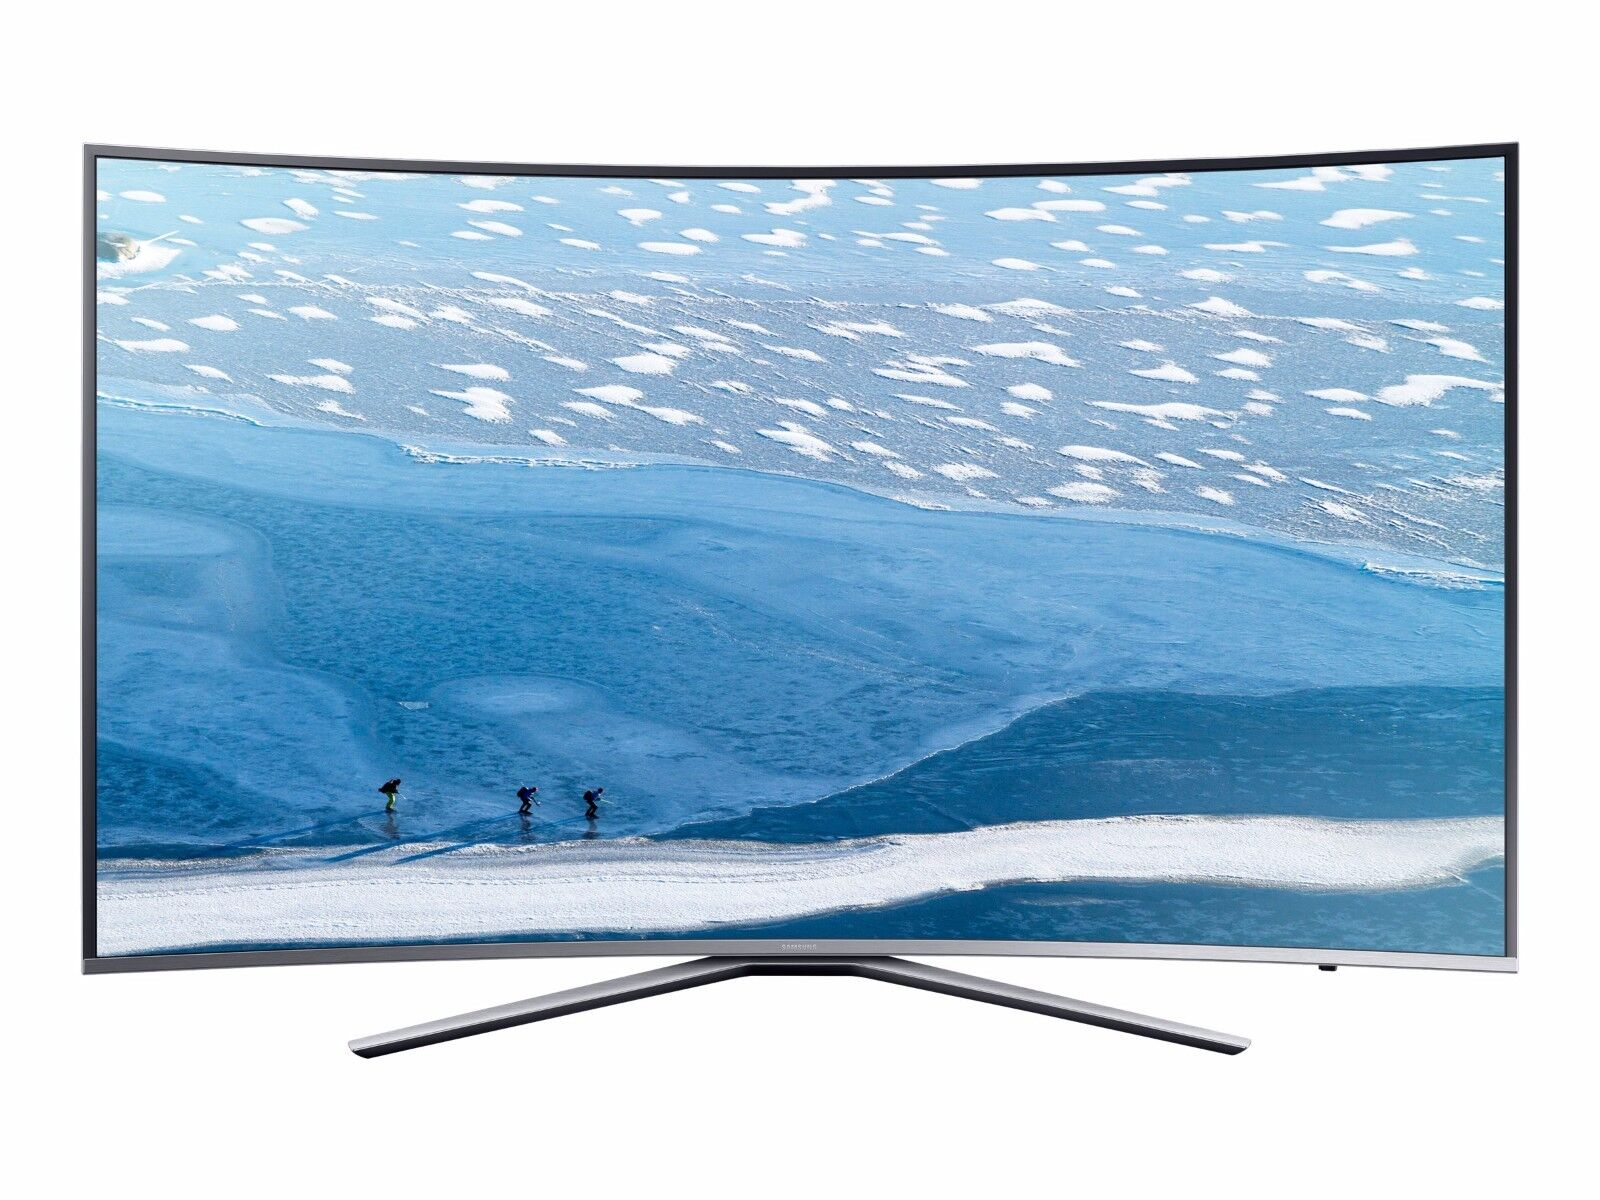 TV LED Samsung Smart UE43KU6500 Ultra HD 4K Curvo Televisore 43